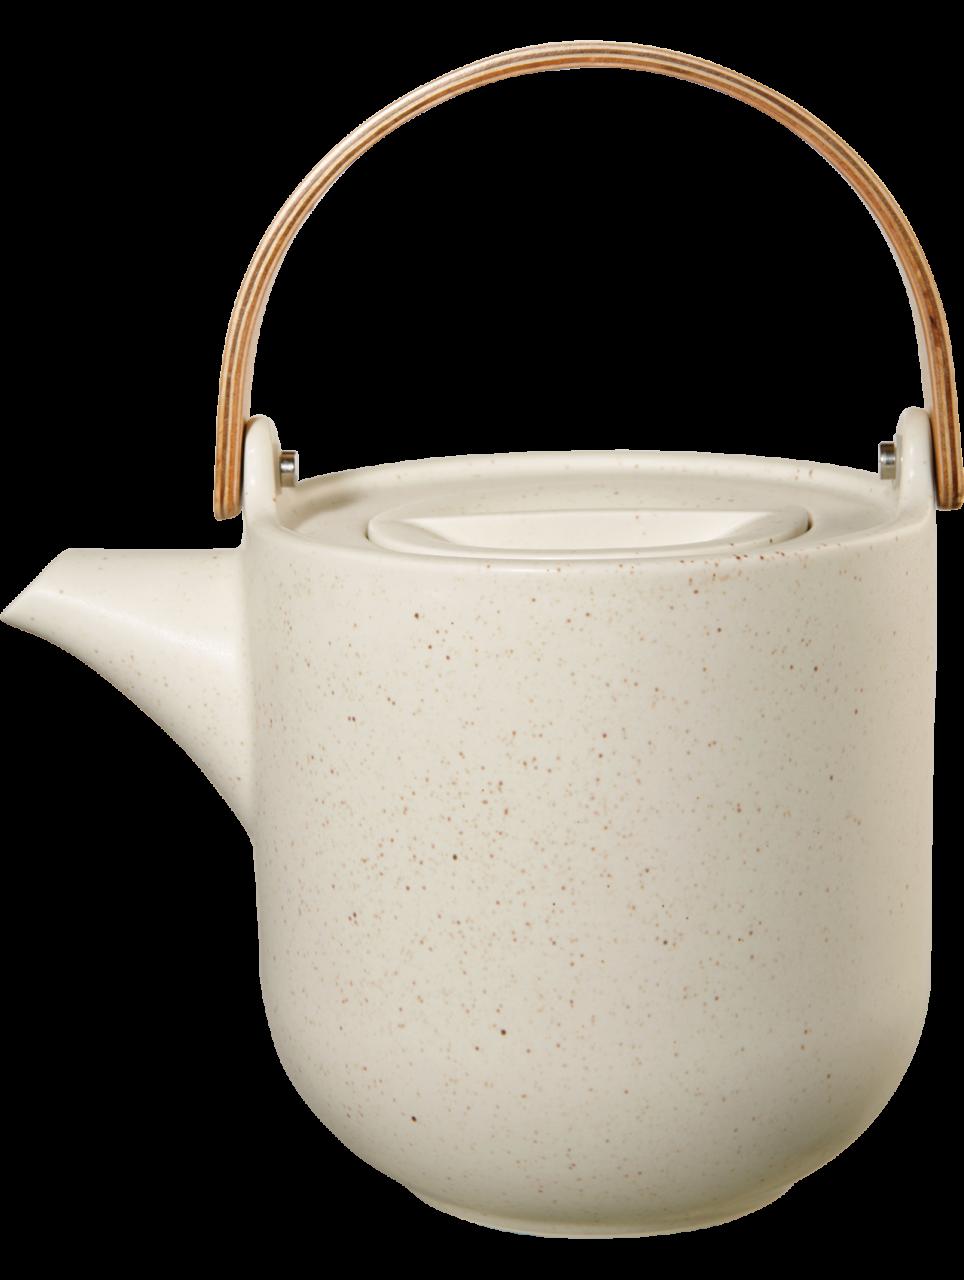 Teekanne mit Holzgriff, sencha